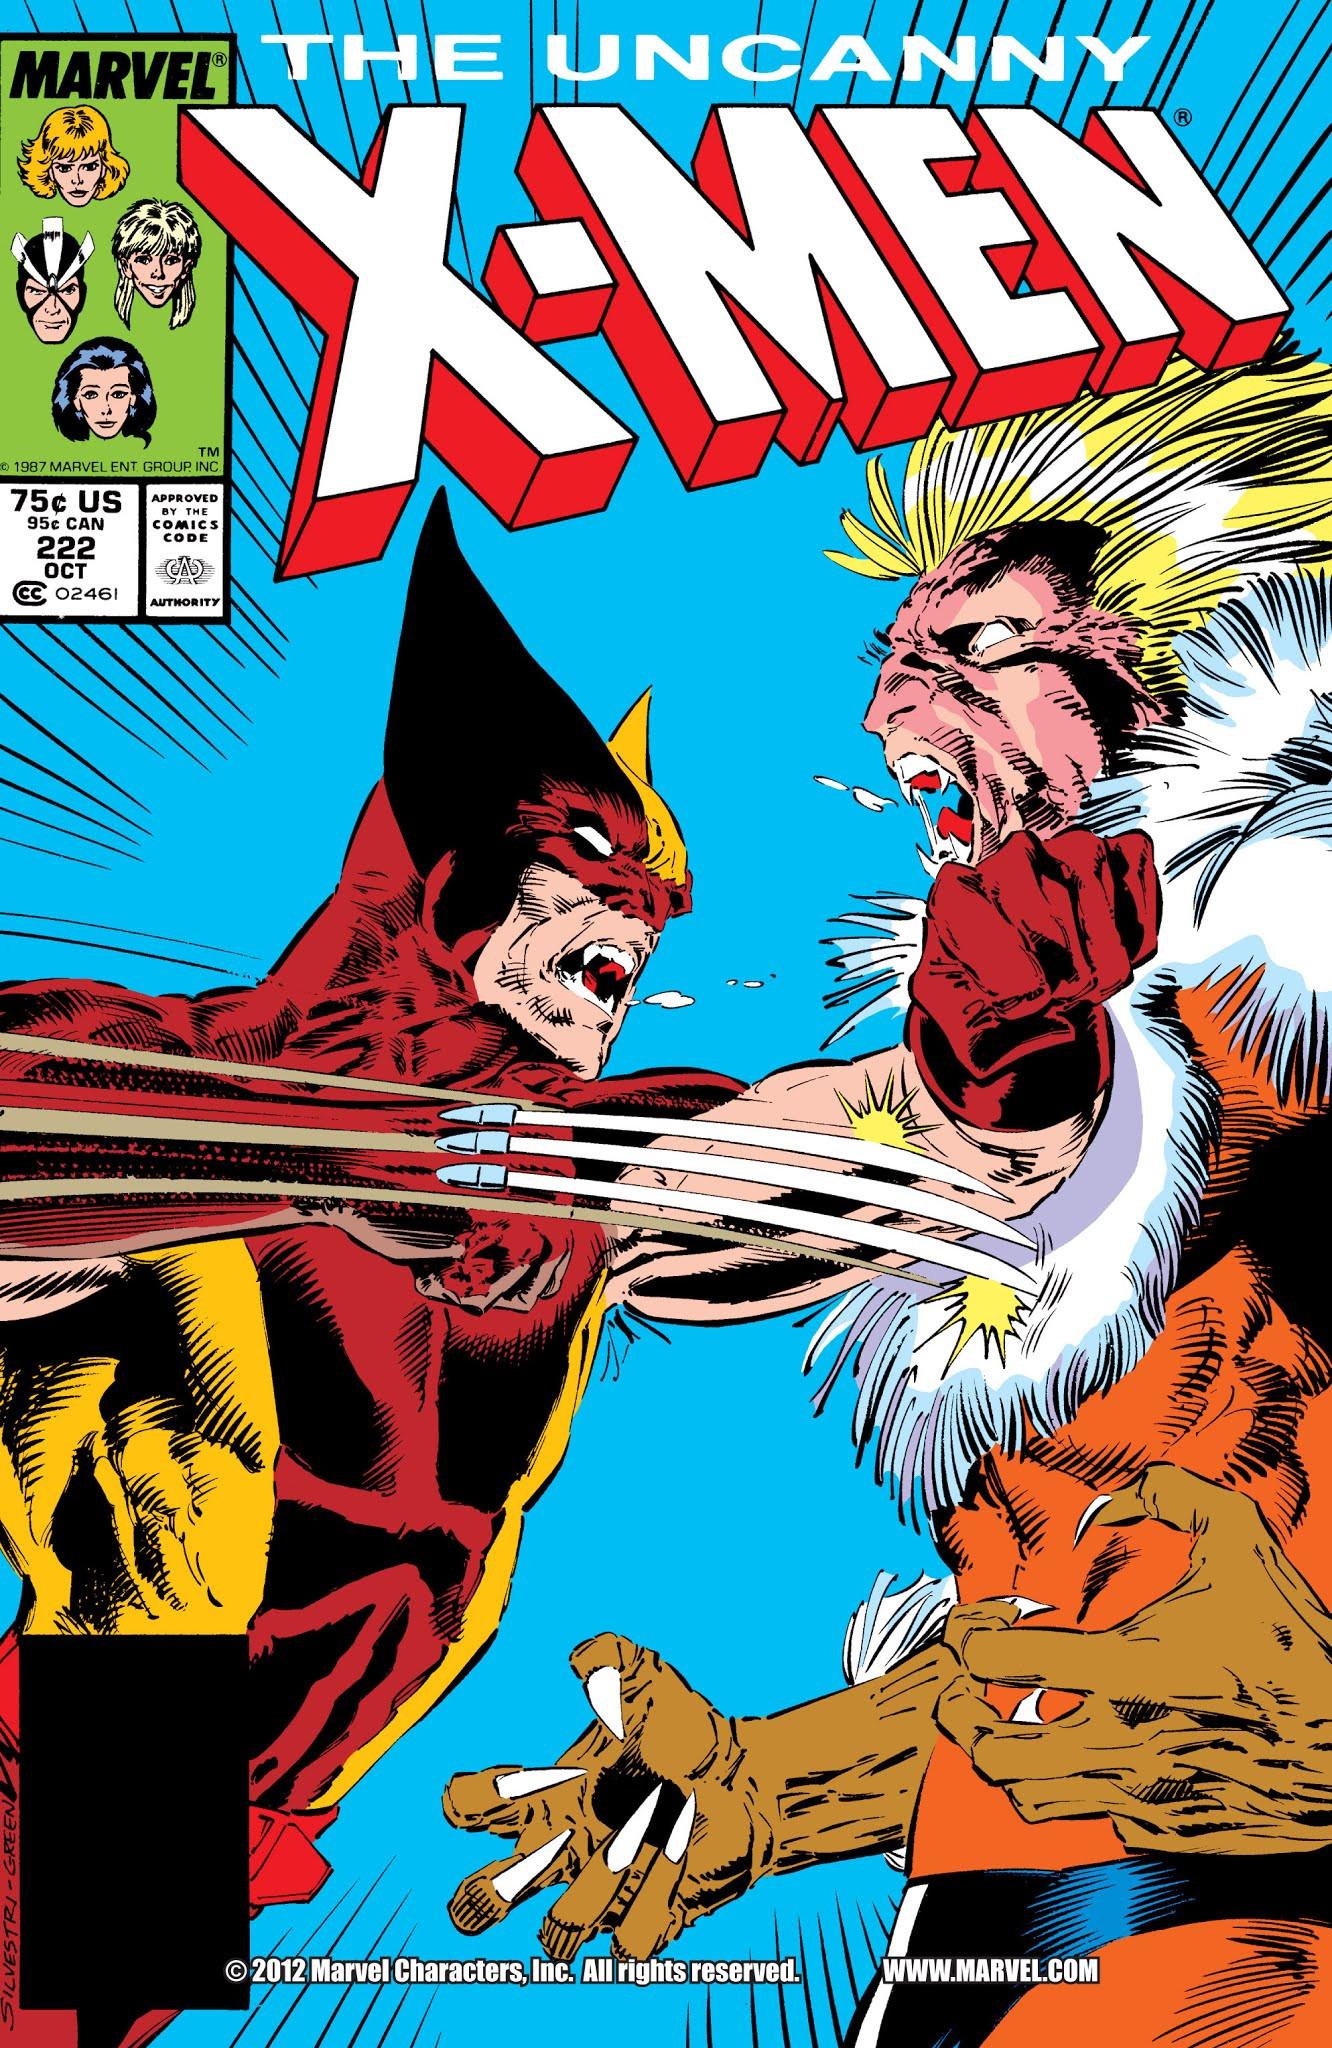 Uncanny X-Men Vol 1 222 - Marvel Database - Wikia